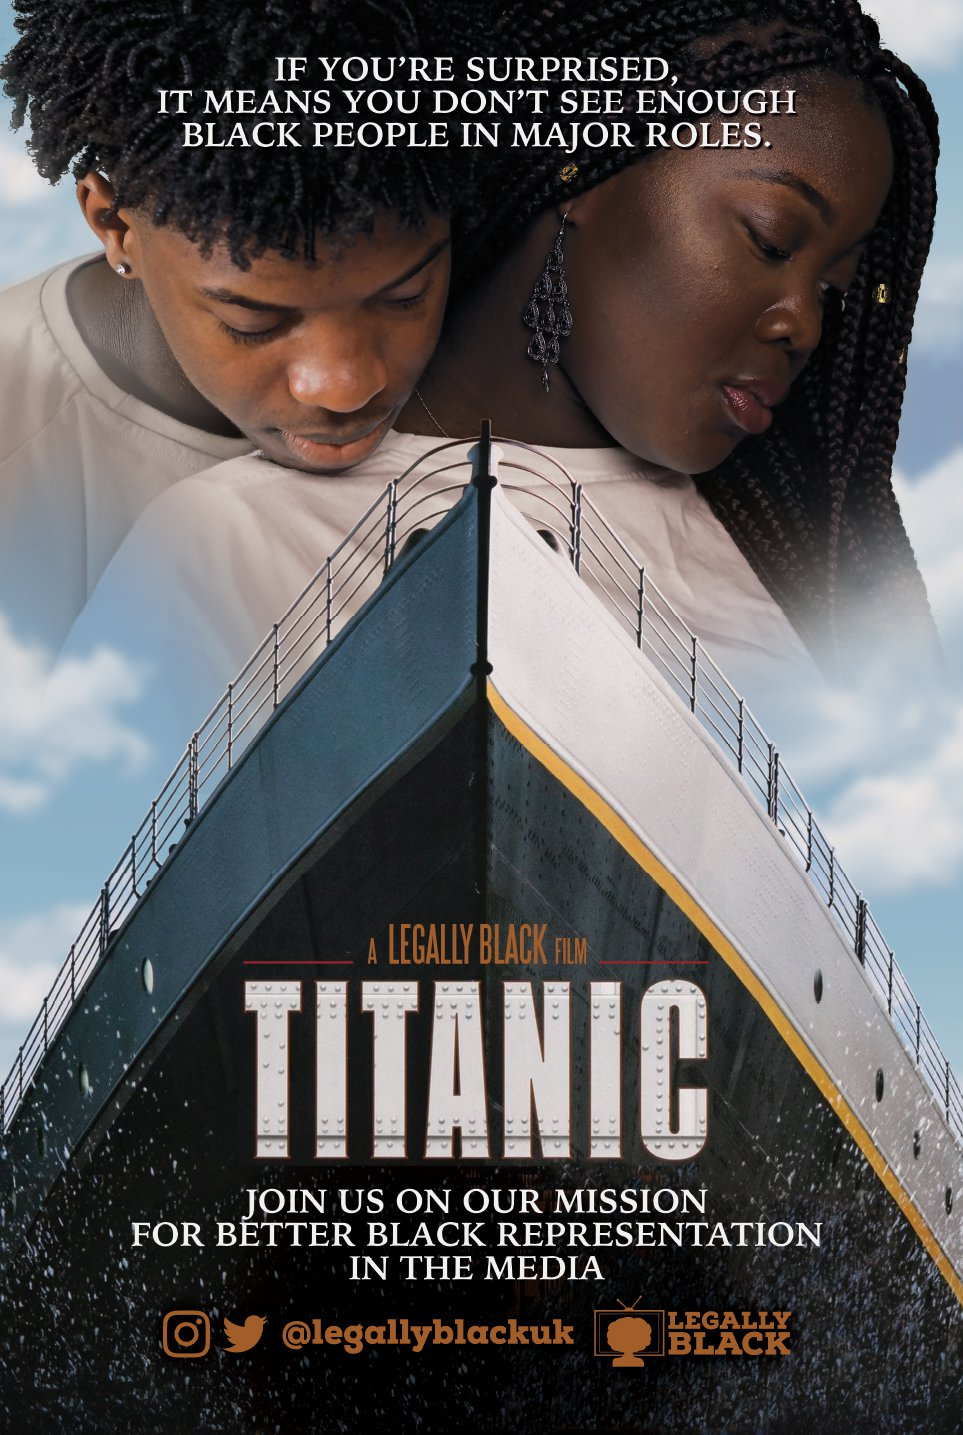 titanic edited.jpg